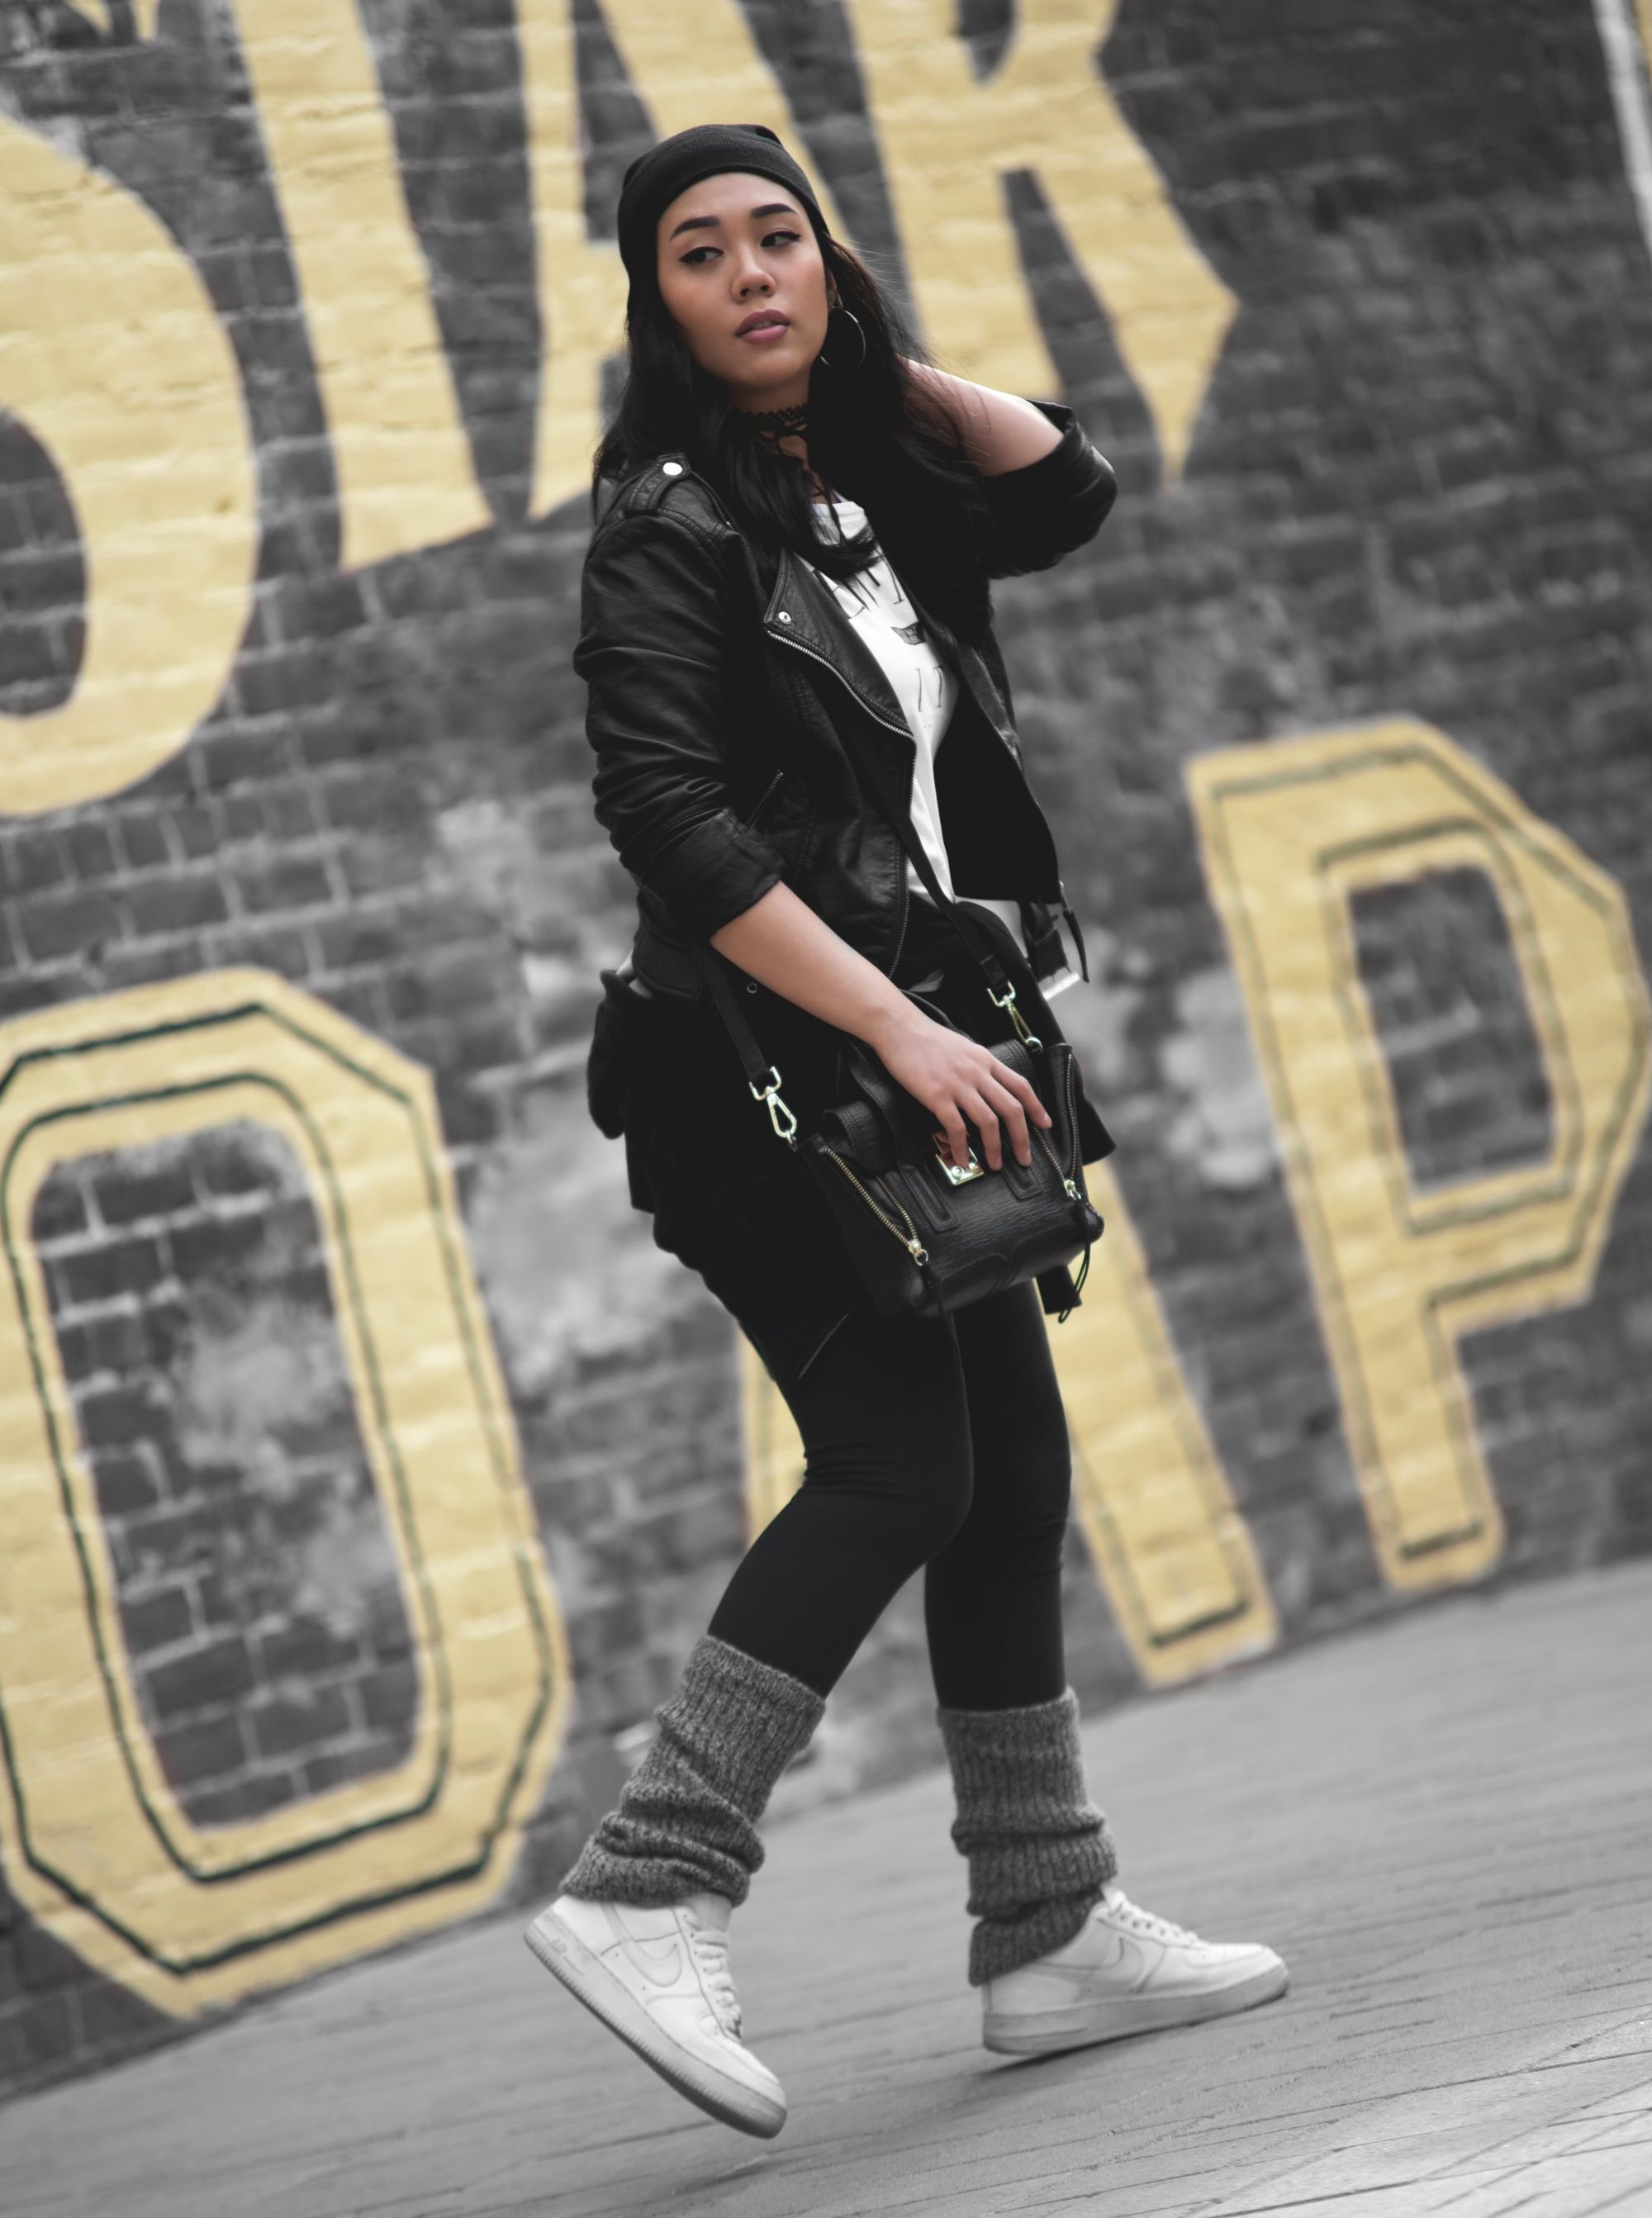 Beanie: $7, Handbag: $59.61, Moto Jacket: $32.90, Graphic Tee: $8.90, Leg Warmers: $10, Shoes: $90.00 - www.theballeronabudget.com